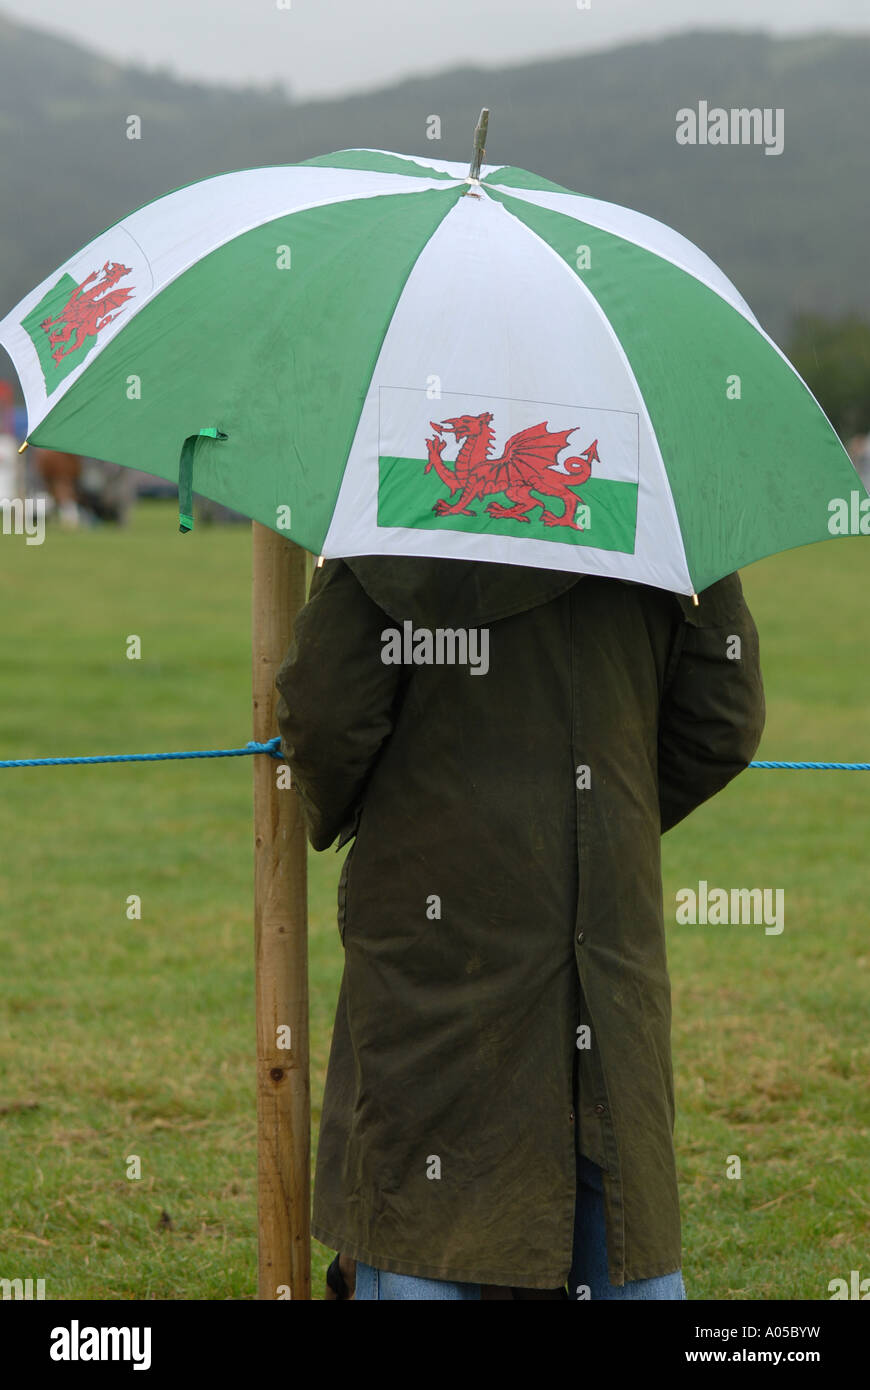 Welsh Umbrella Stock Photos & Welsh Umbrella Stock Images - Alamy